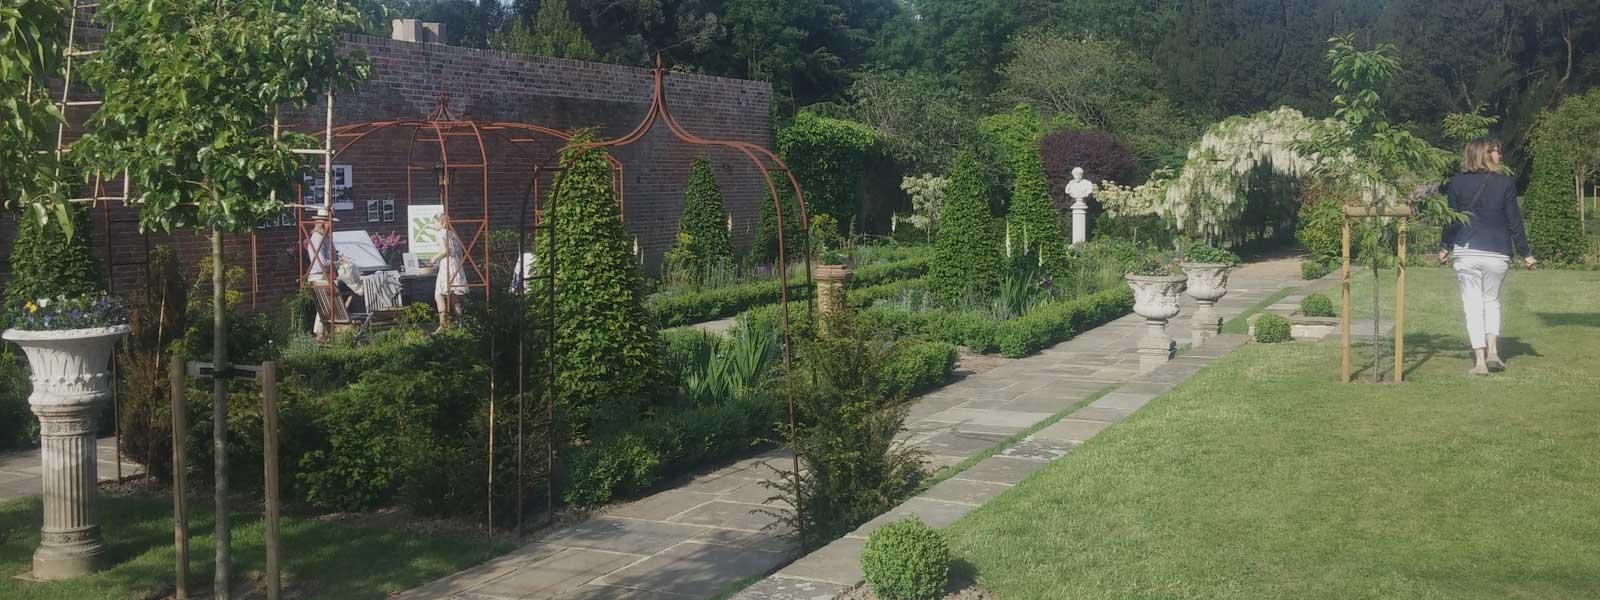 Tenterden Landscaping Project